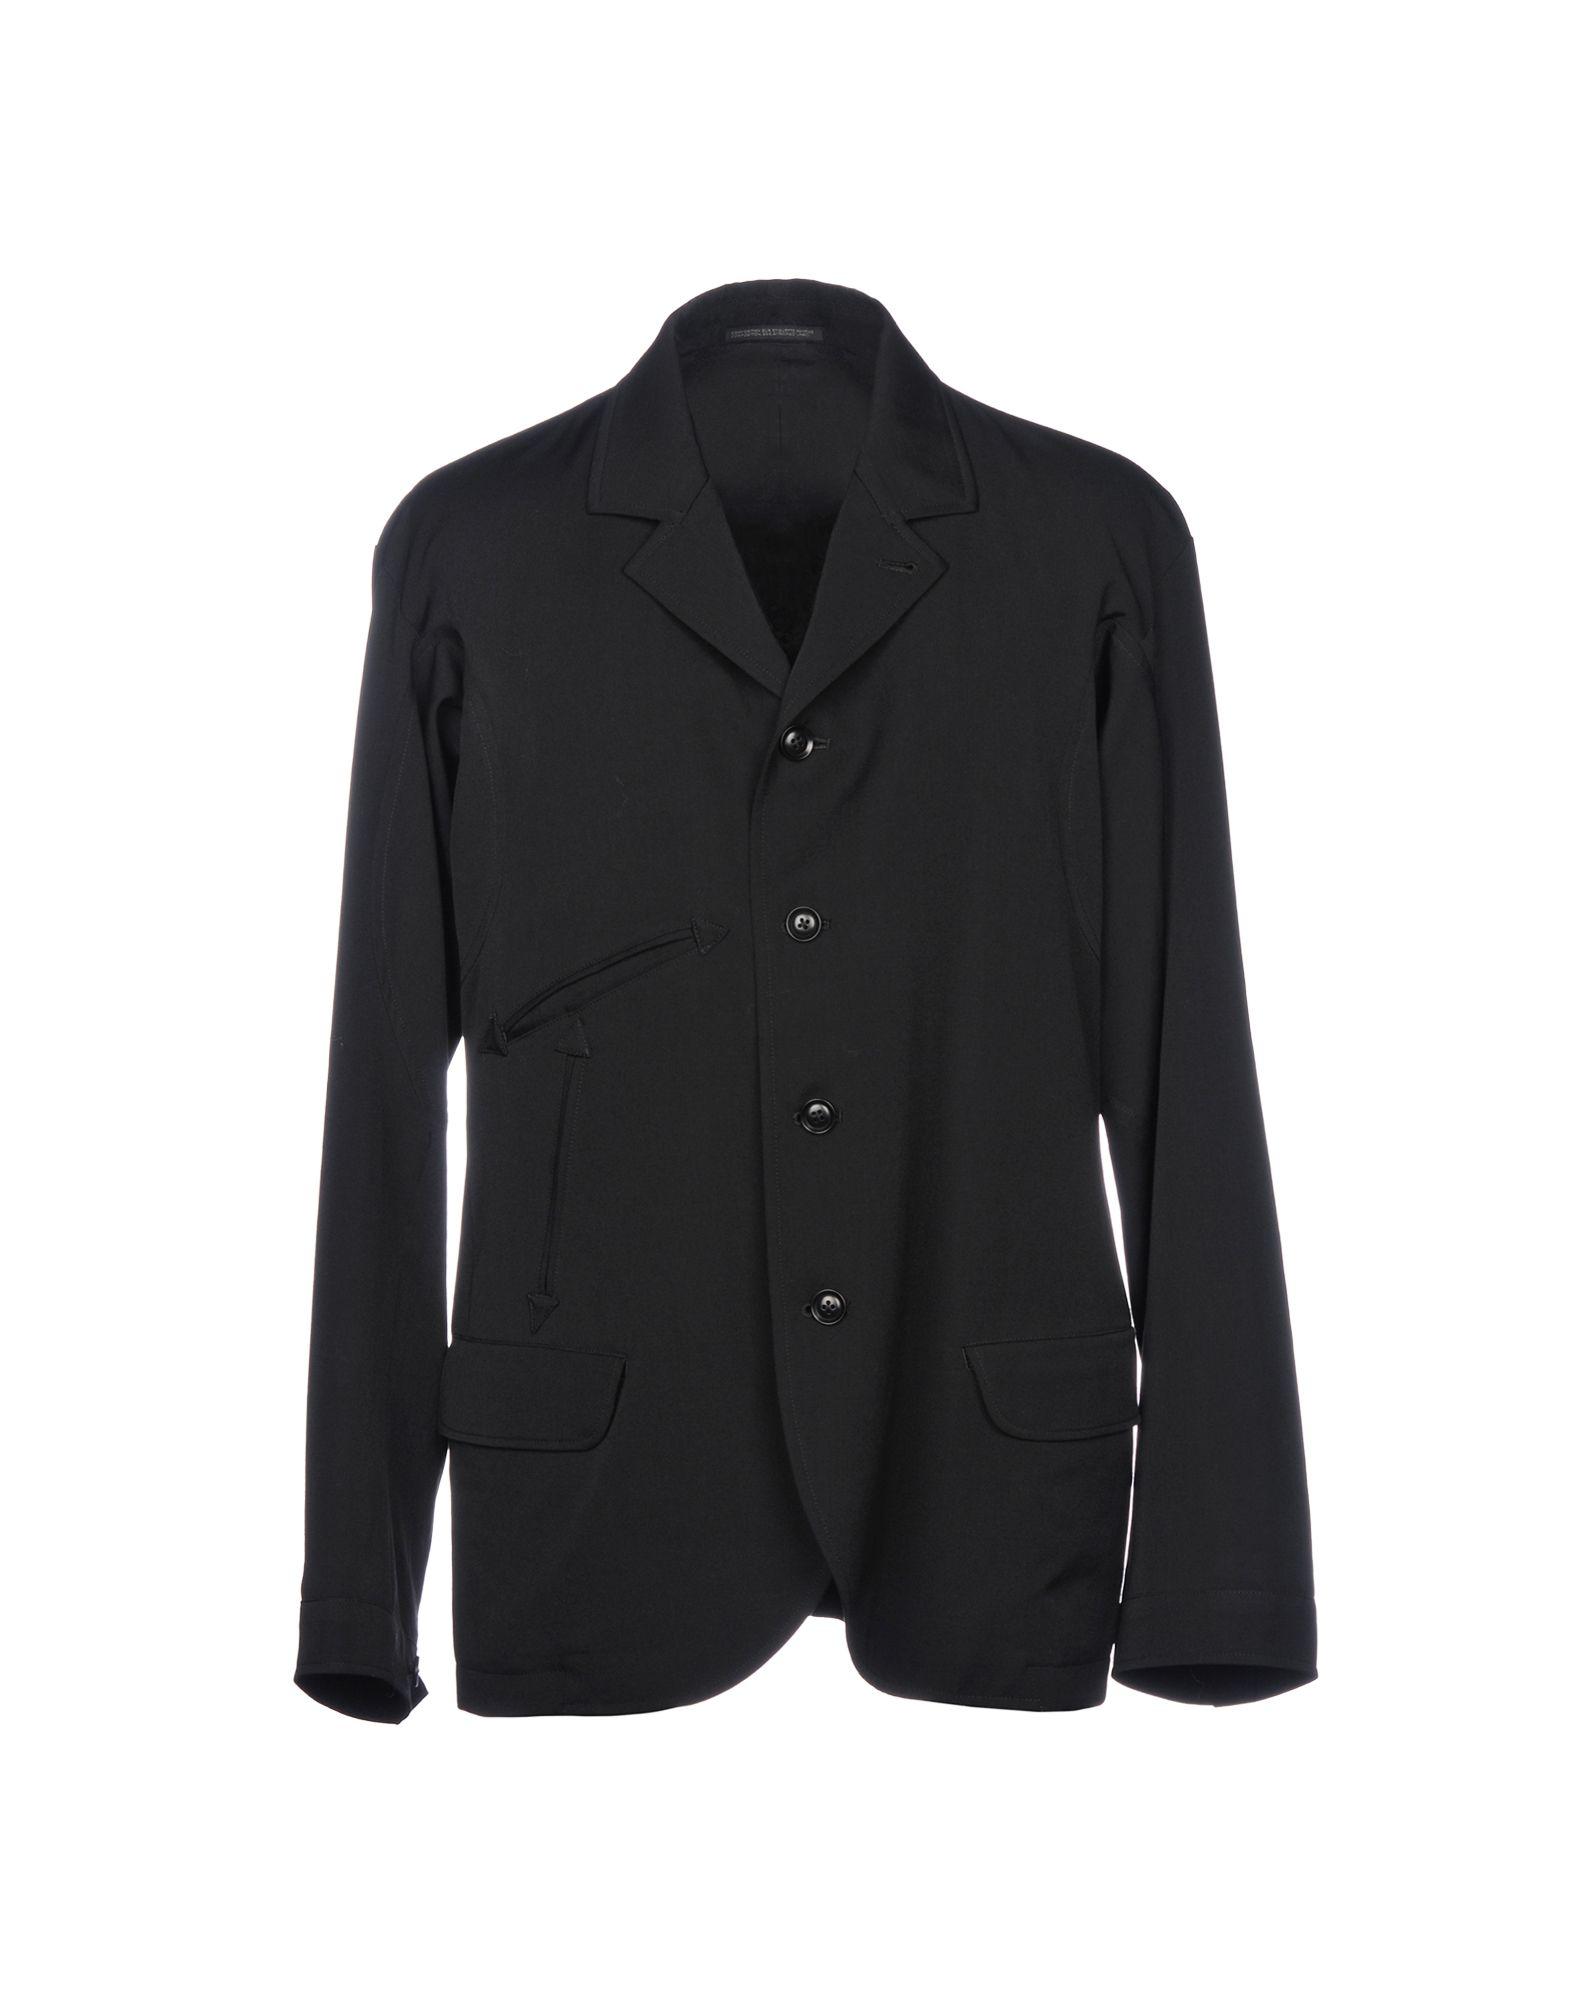 YOHJI YAMAMOTO POUR HOMME Пиджак пиджак костюм tudor homme 233y38f90